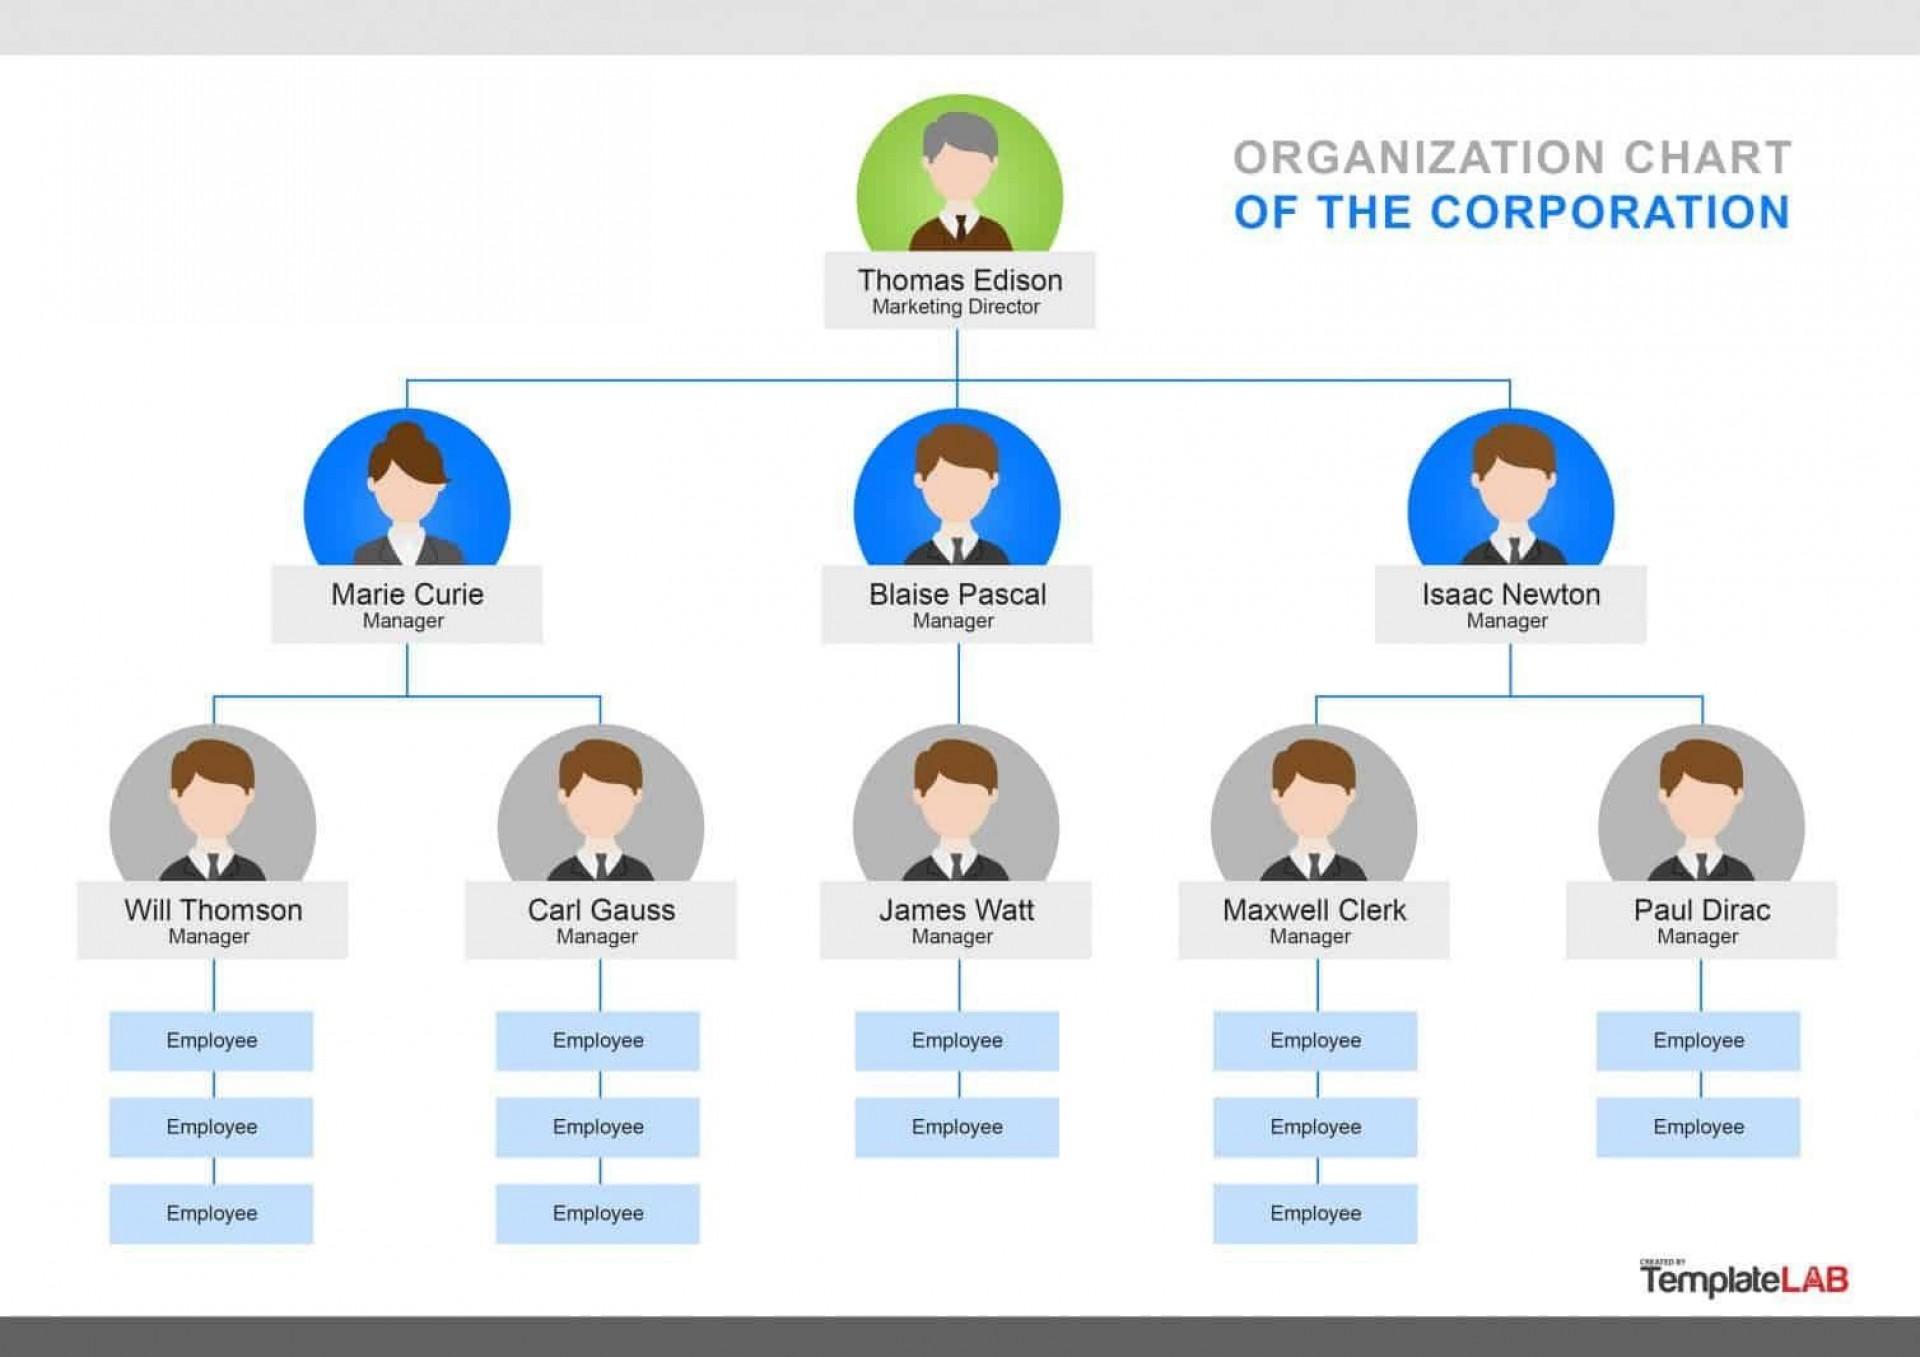 000 Impressive Microsoft Organizational Chart Template High Def  Templates Visio Org M Office Organization Powerpoint1920